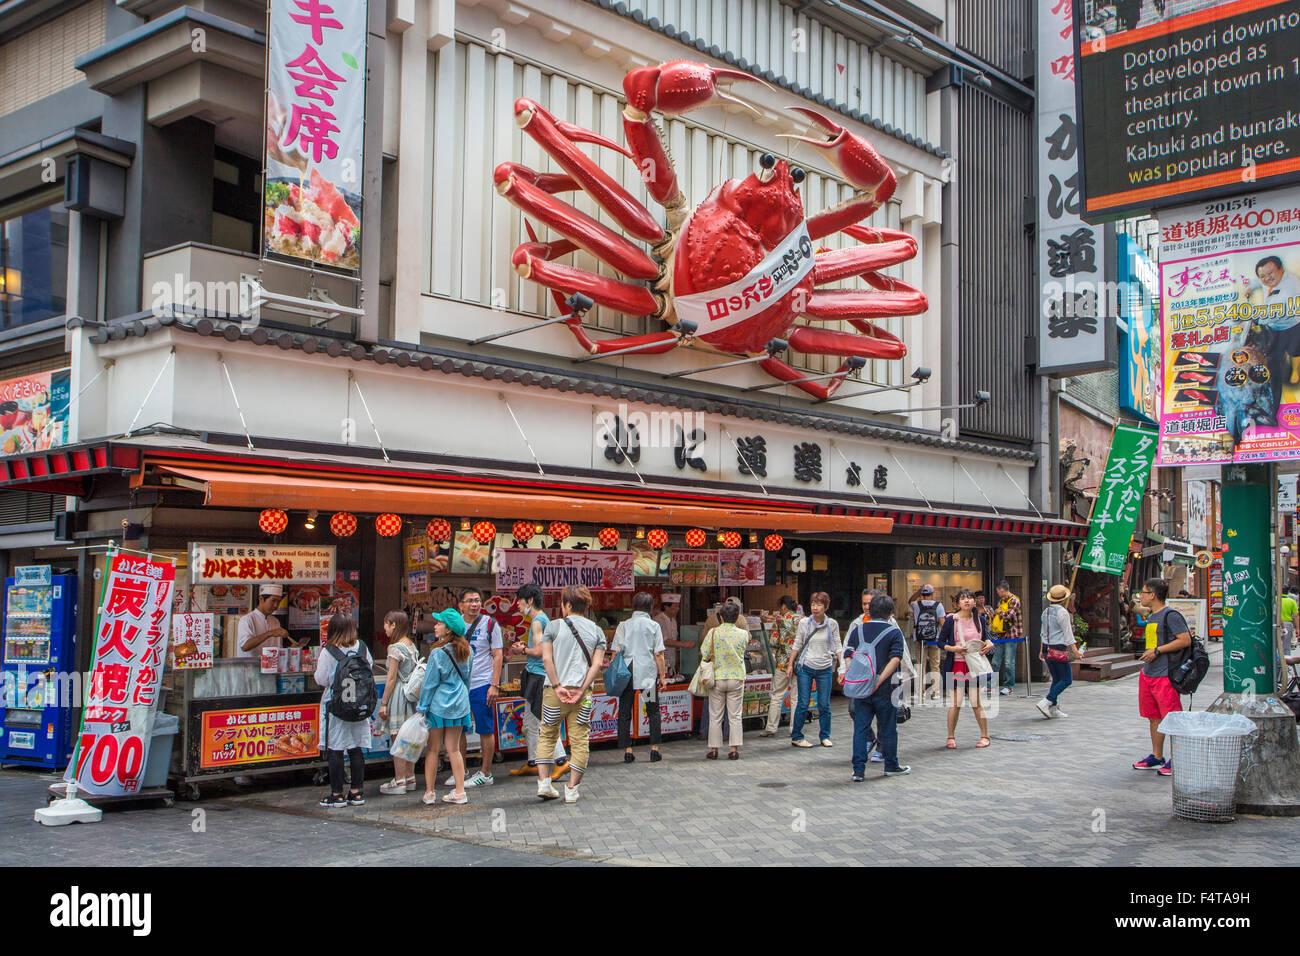 Giappone, città di Osaka, Dotombori Area, Immagini Stock